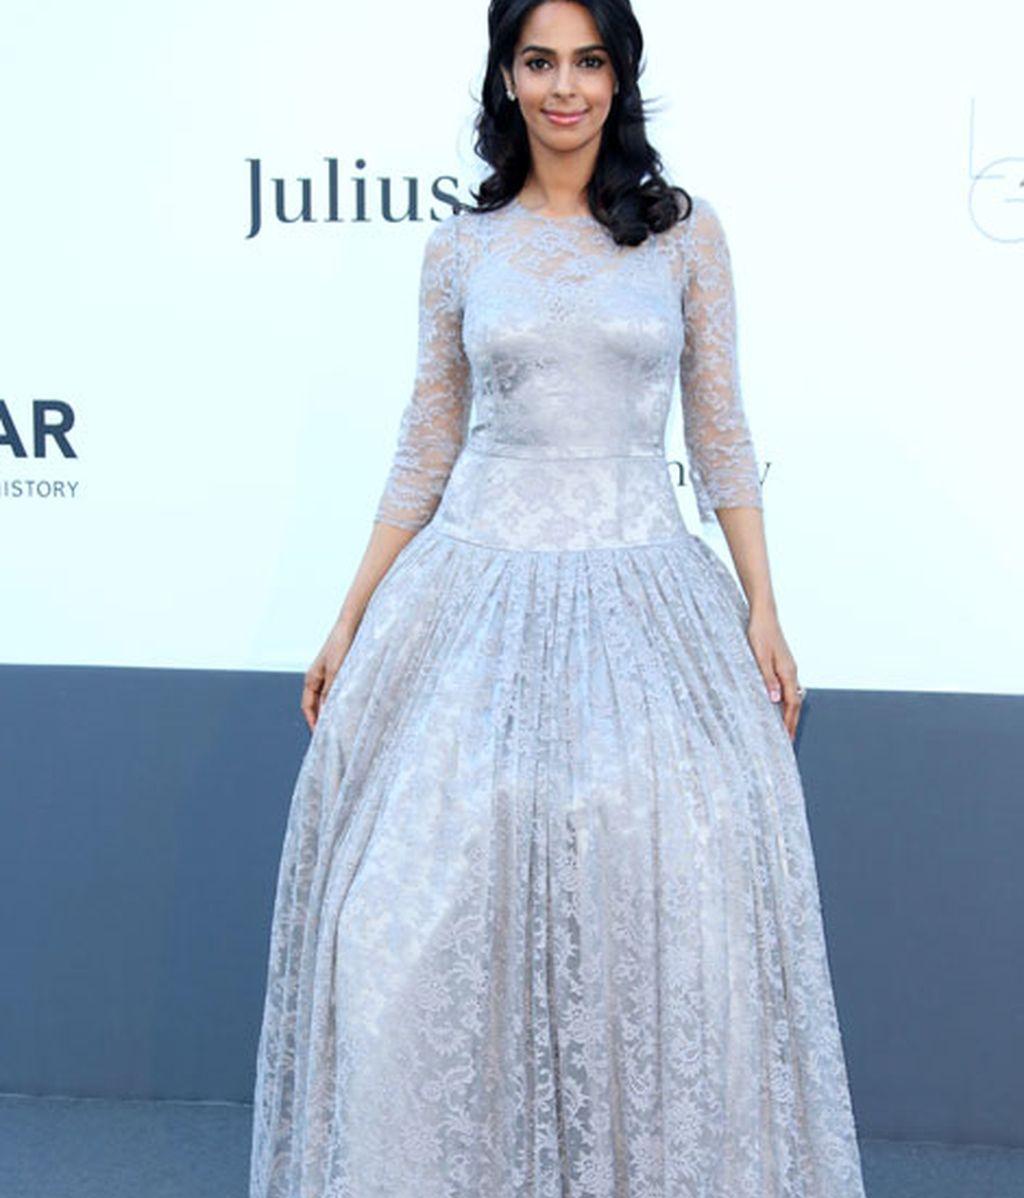 Mallika Sherawat llevó un vestido de encaje gris